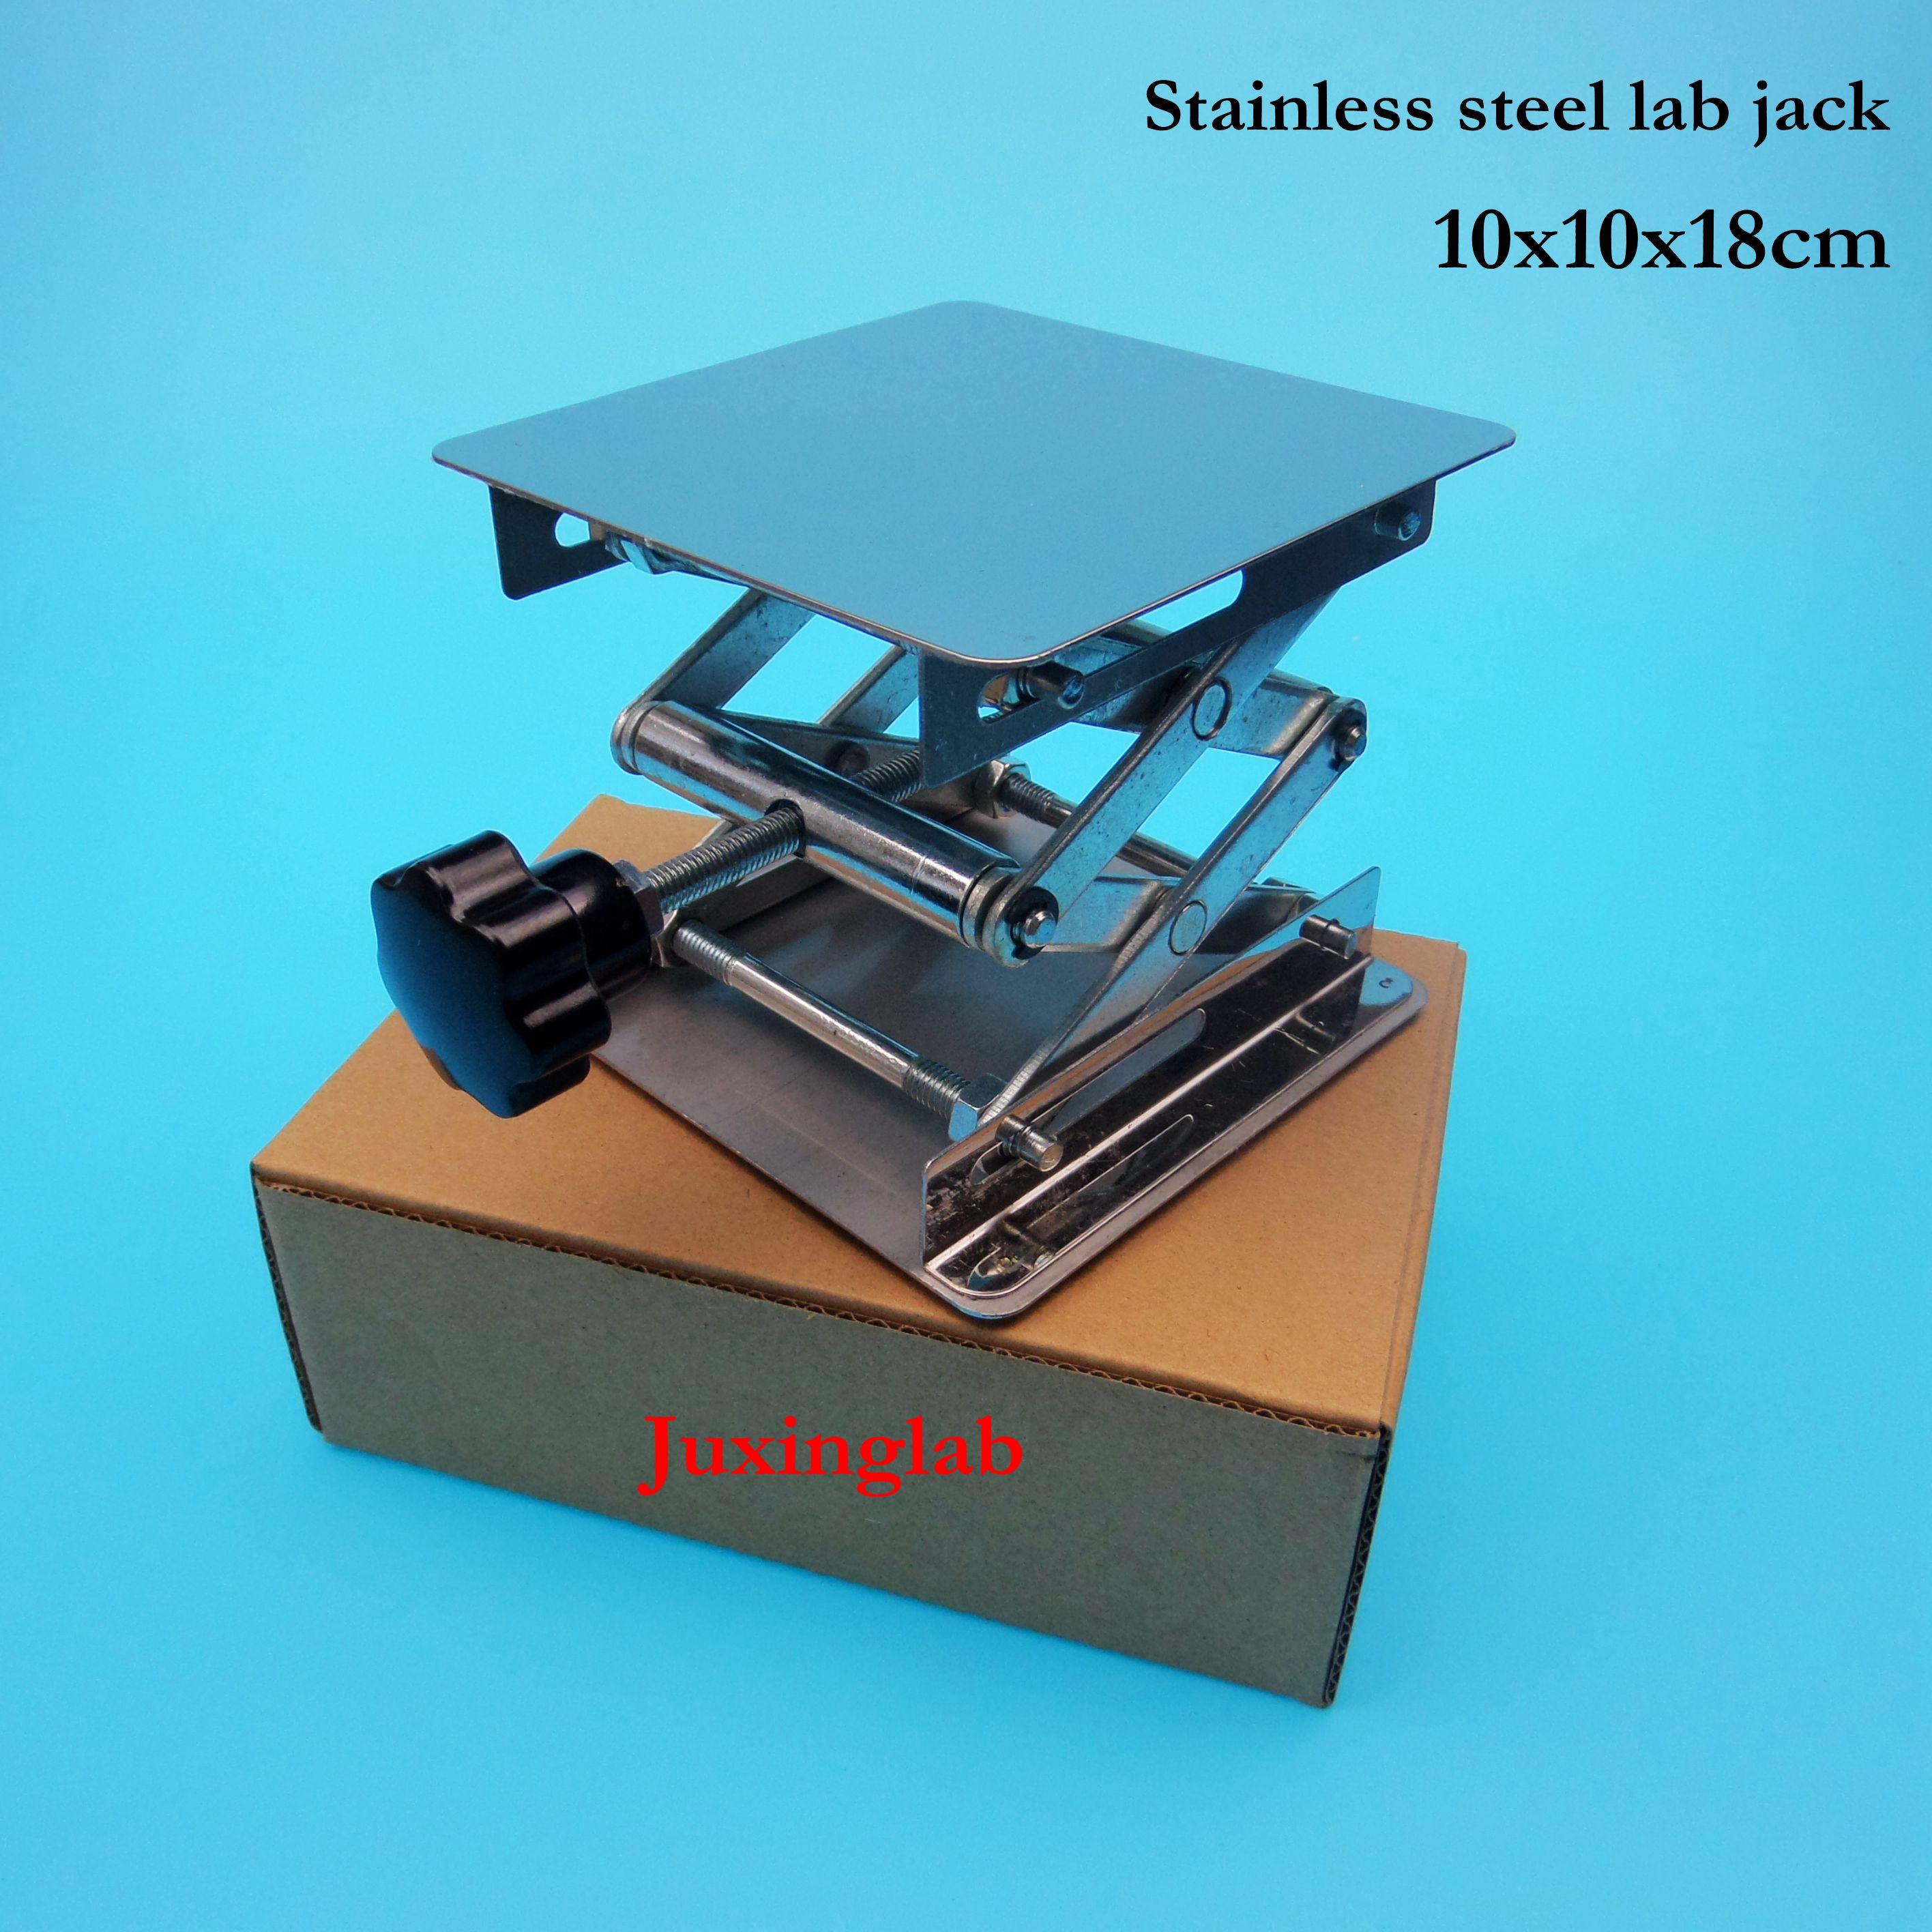 Lab Jack Laboratory Support Jacks 100x100x180mm Stainless Steel Lifting Table Raising Platform 4'' Inch 10x10x18cm